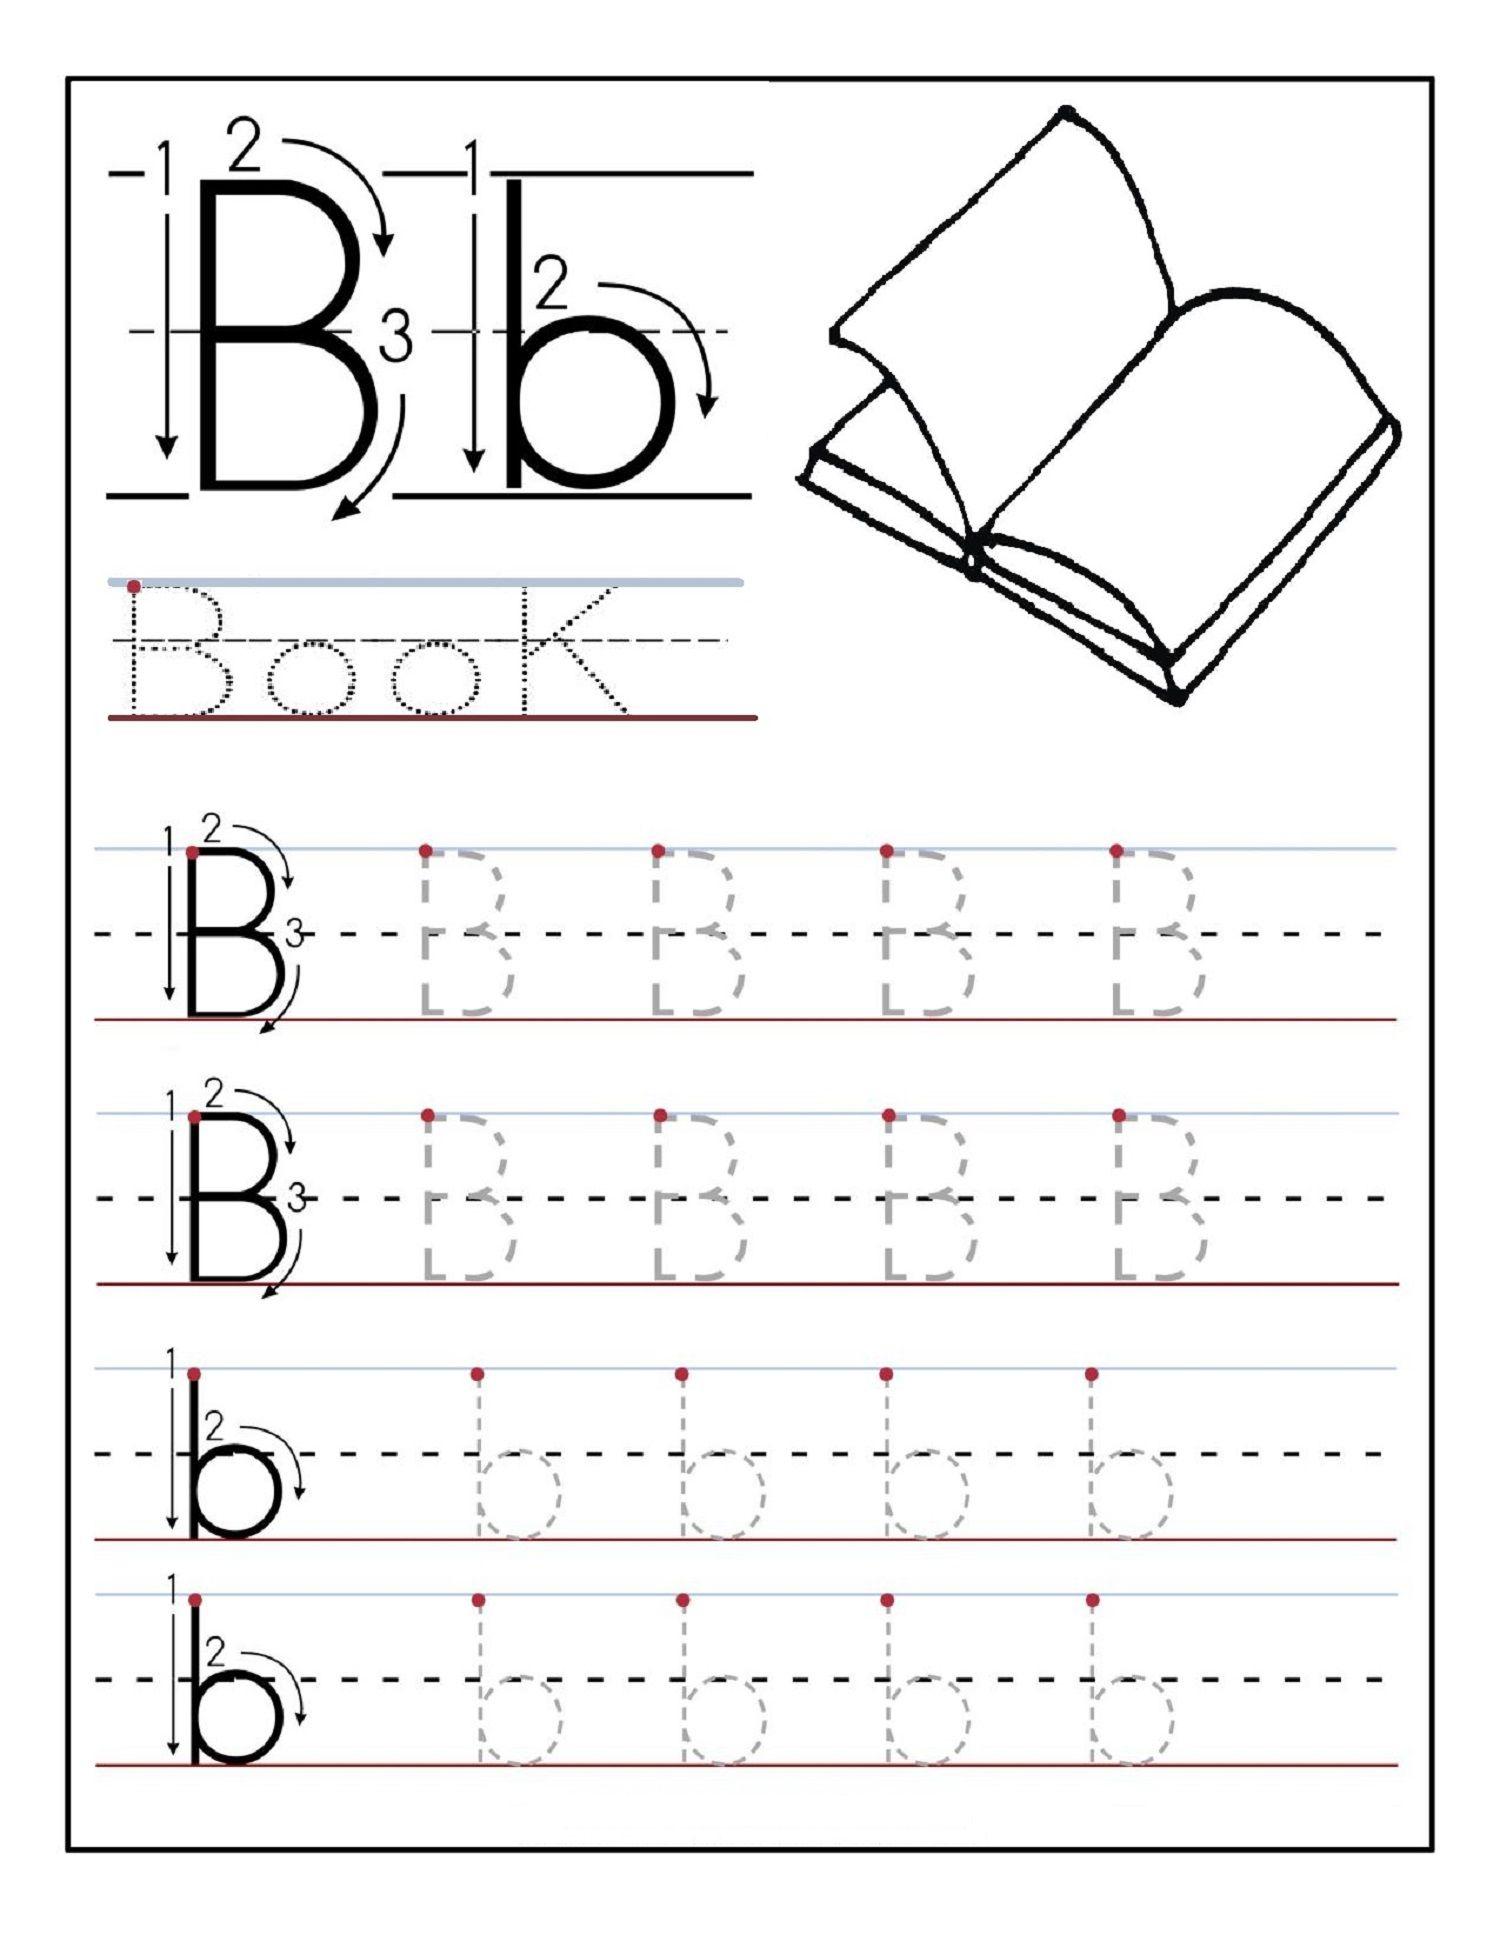 Worksheet Works For Preschool Alphabet Tracing Printables regarding Alphabet Tracing Worksheets For Kindergarten